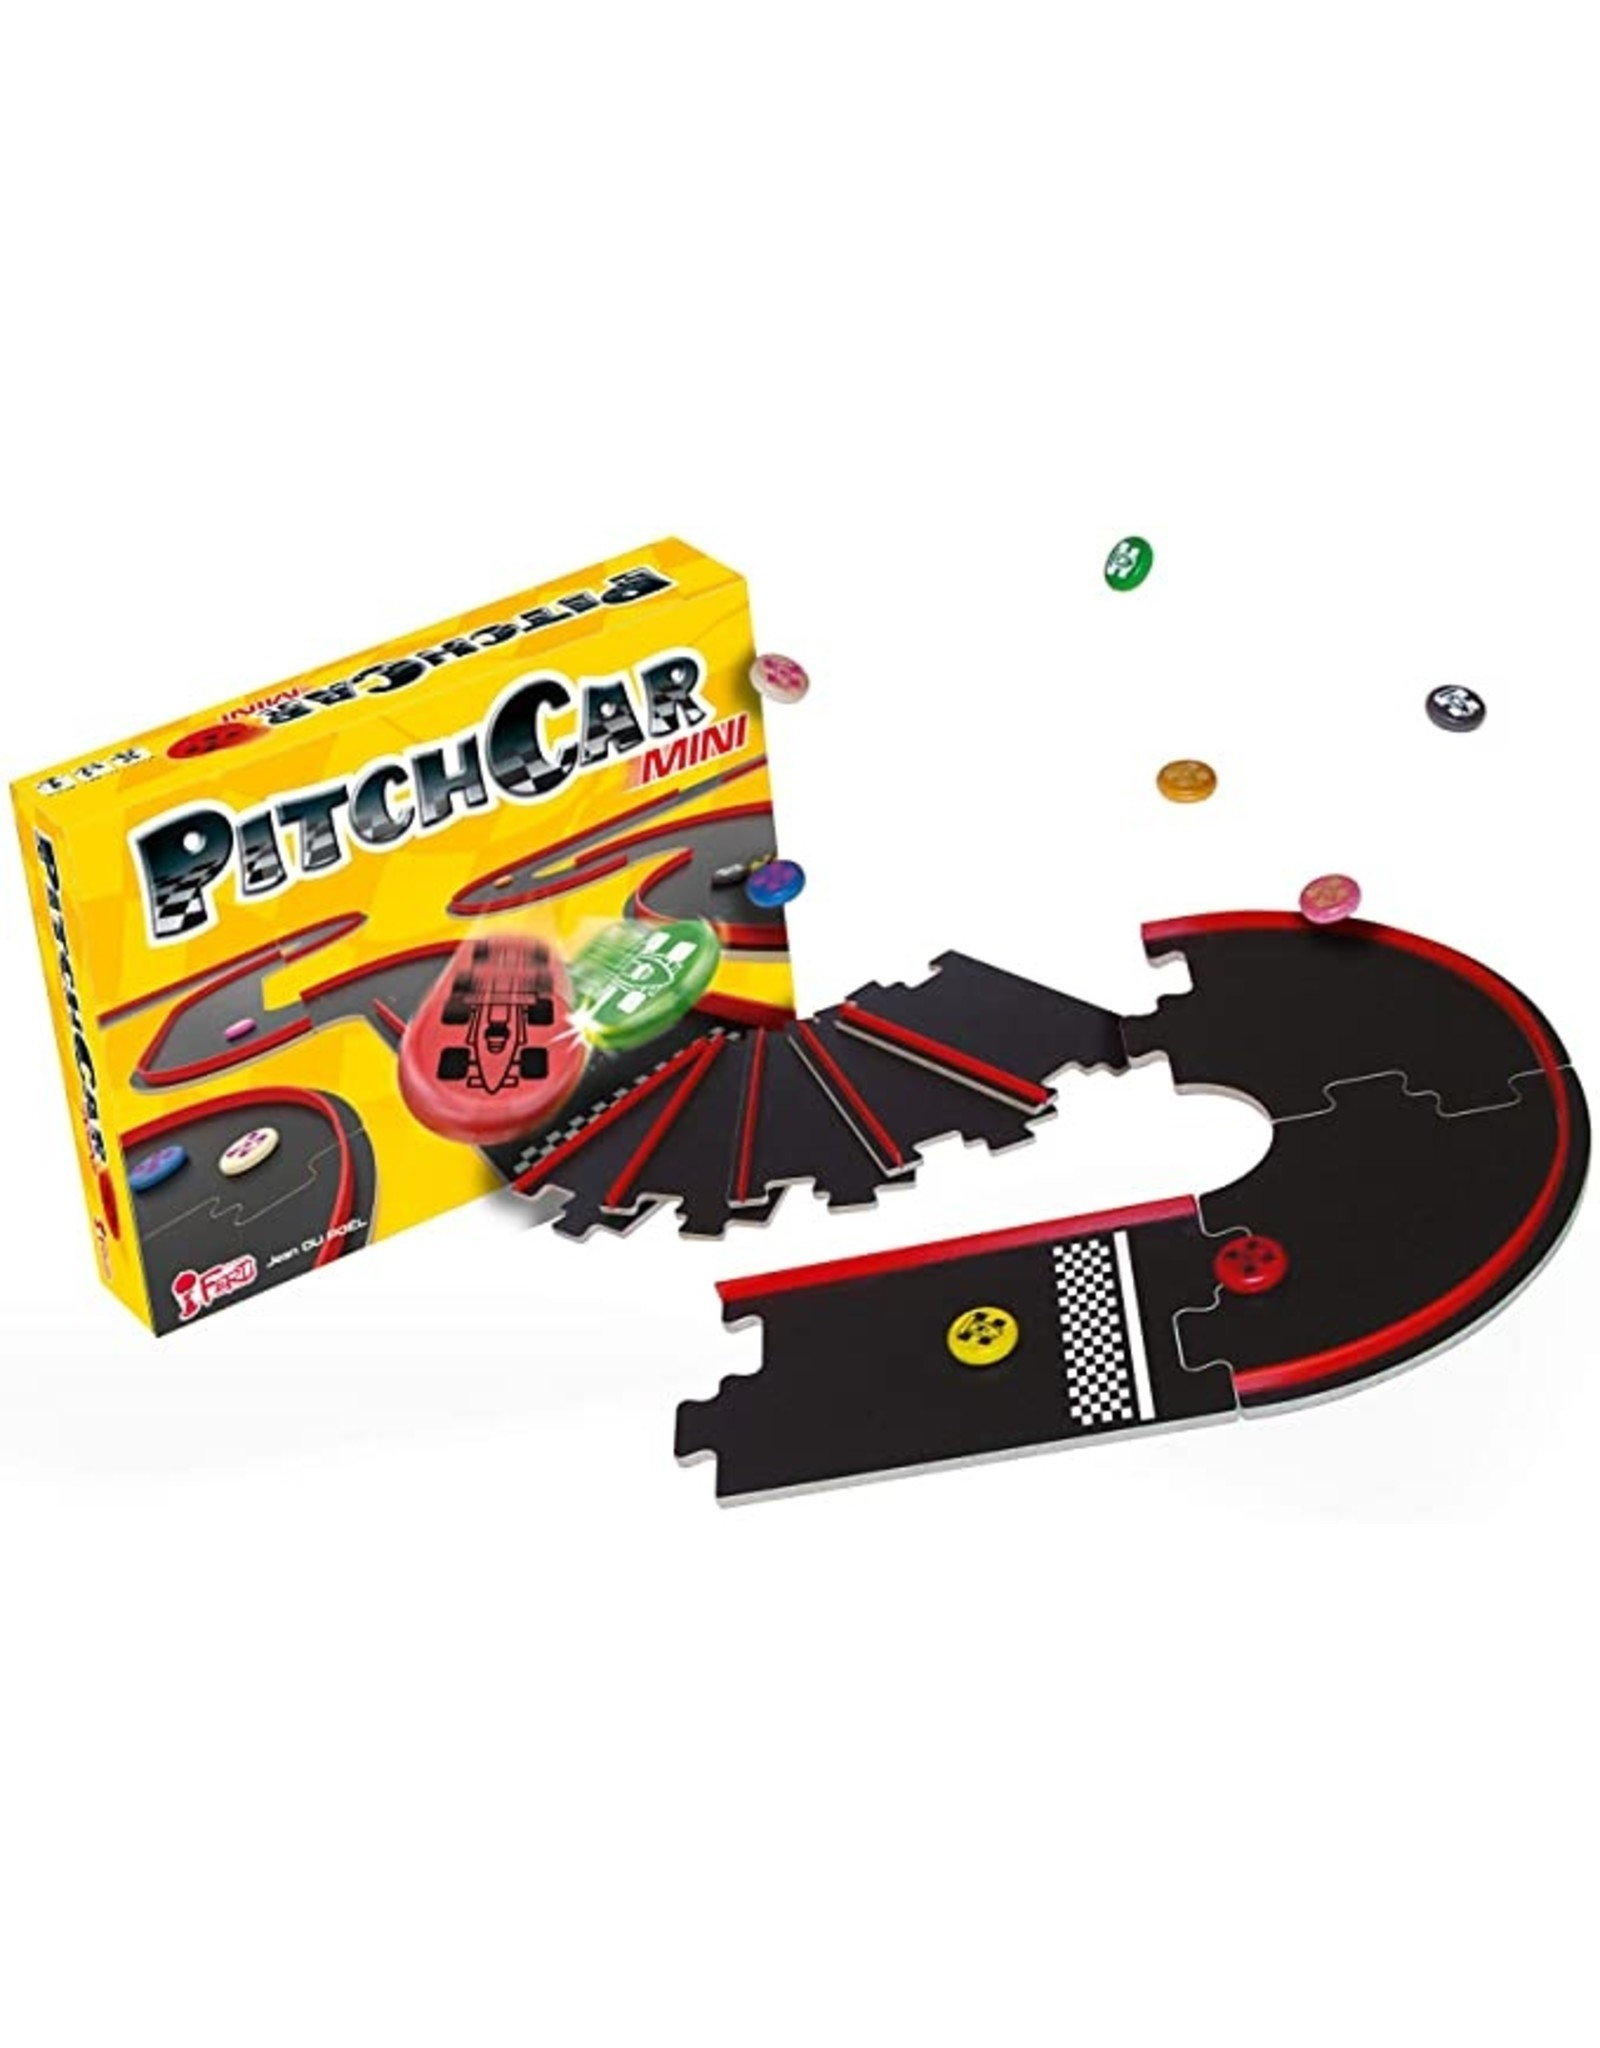 Eagle-Gryphon Games PitchCar Mini